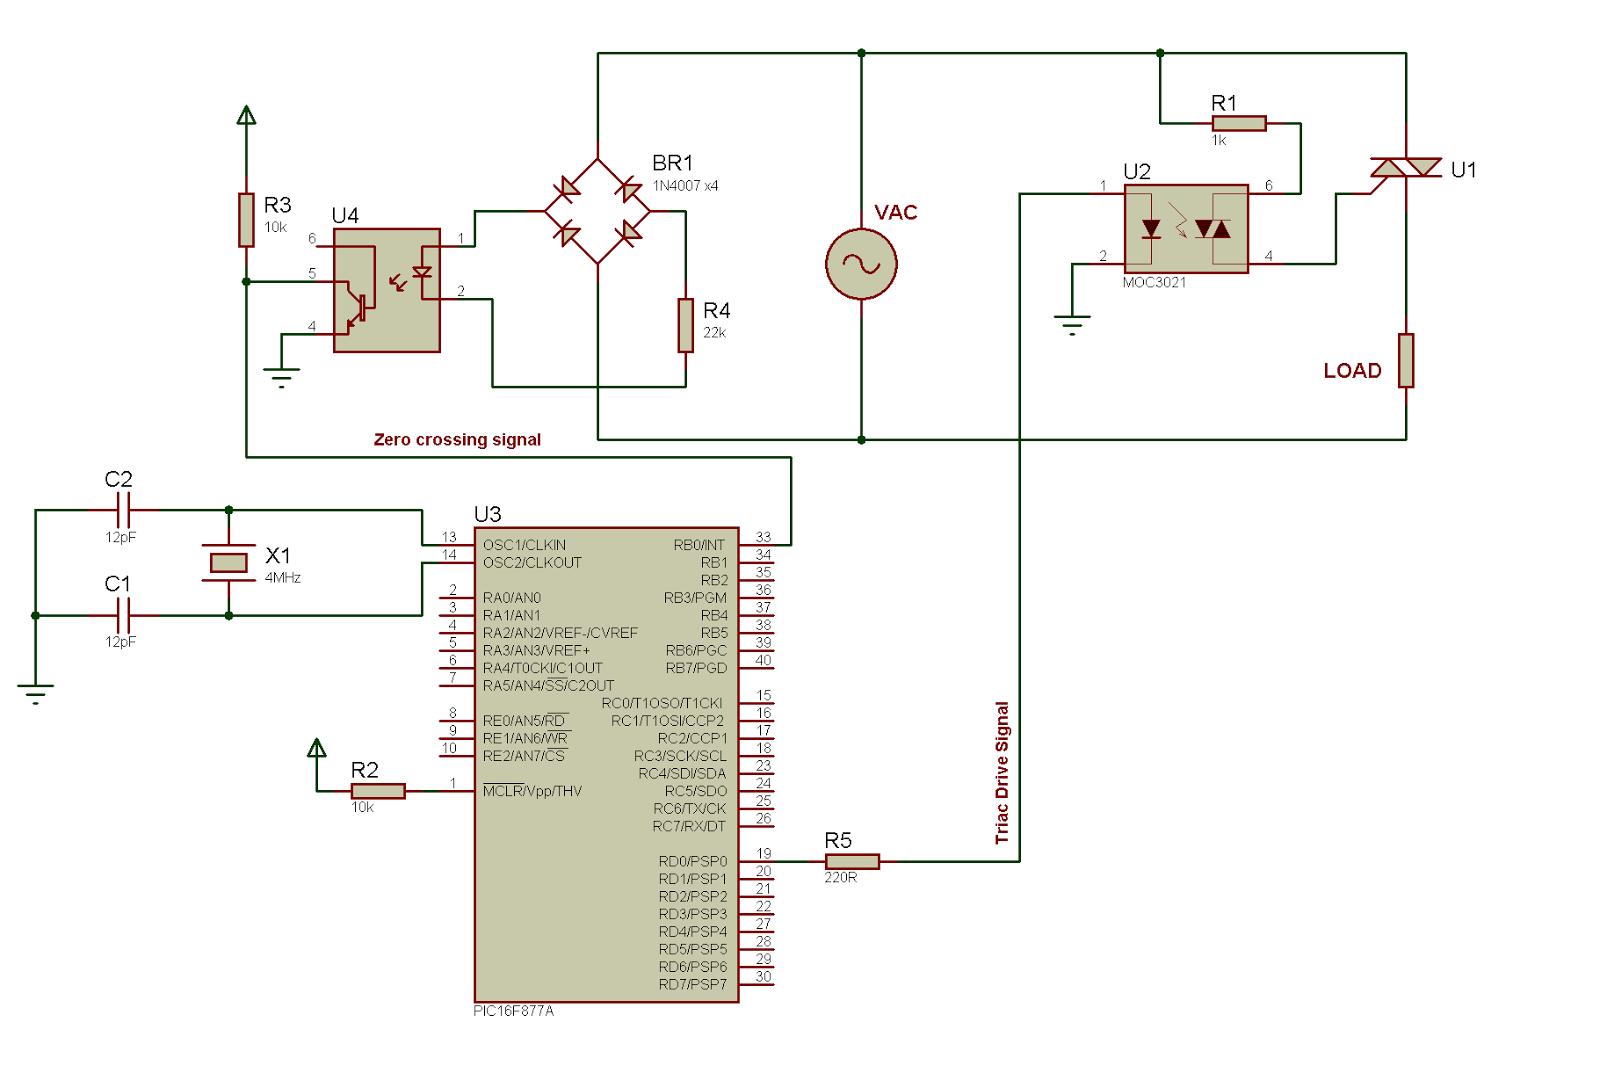 medium resolution of circuit diagram of ac power control with thyristor using pic wiring diagram show